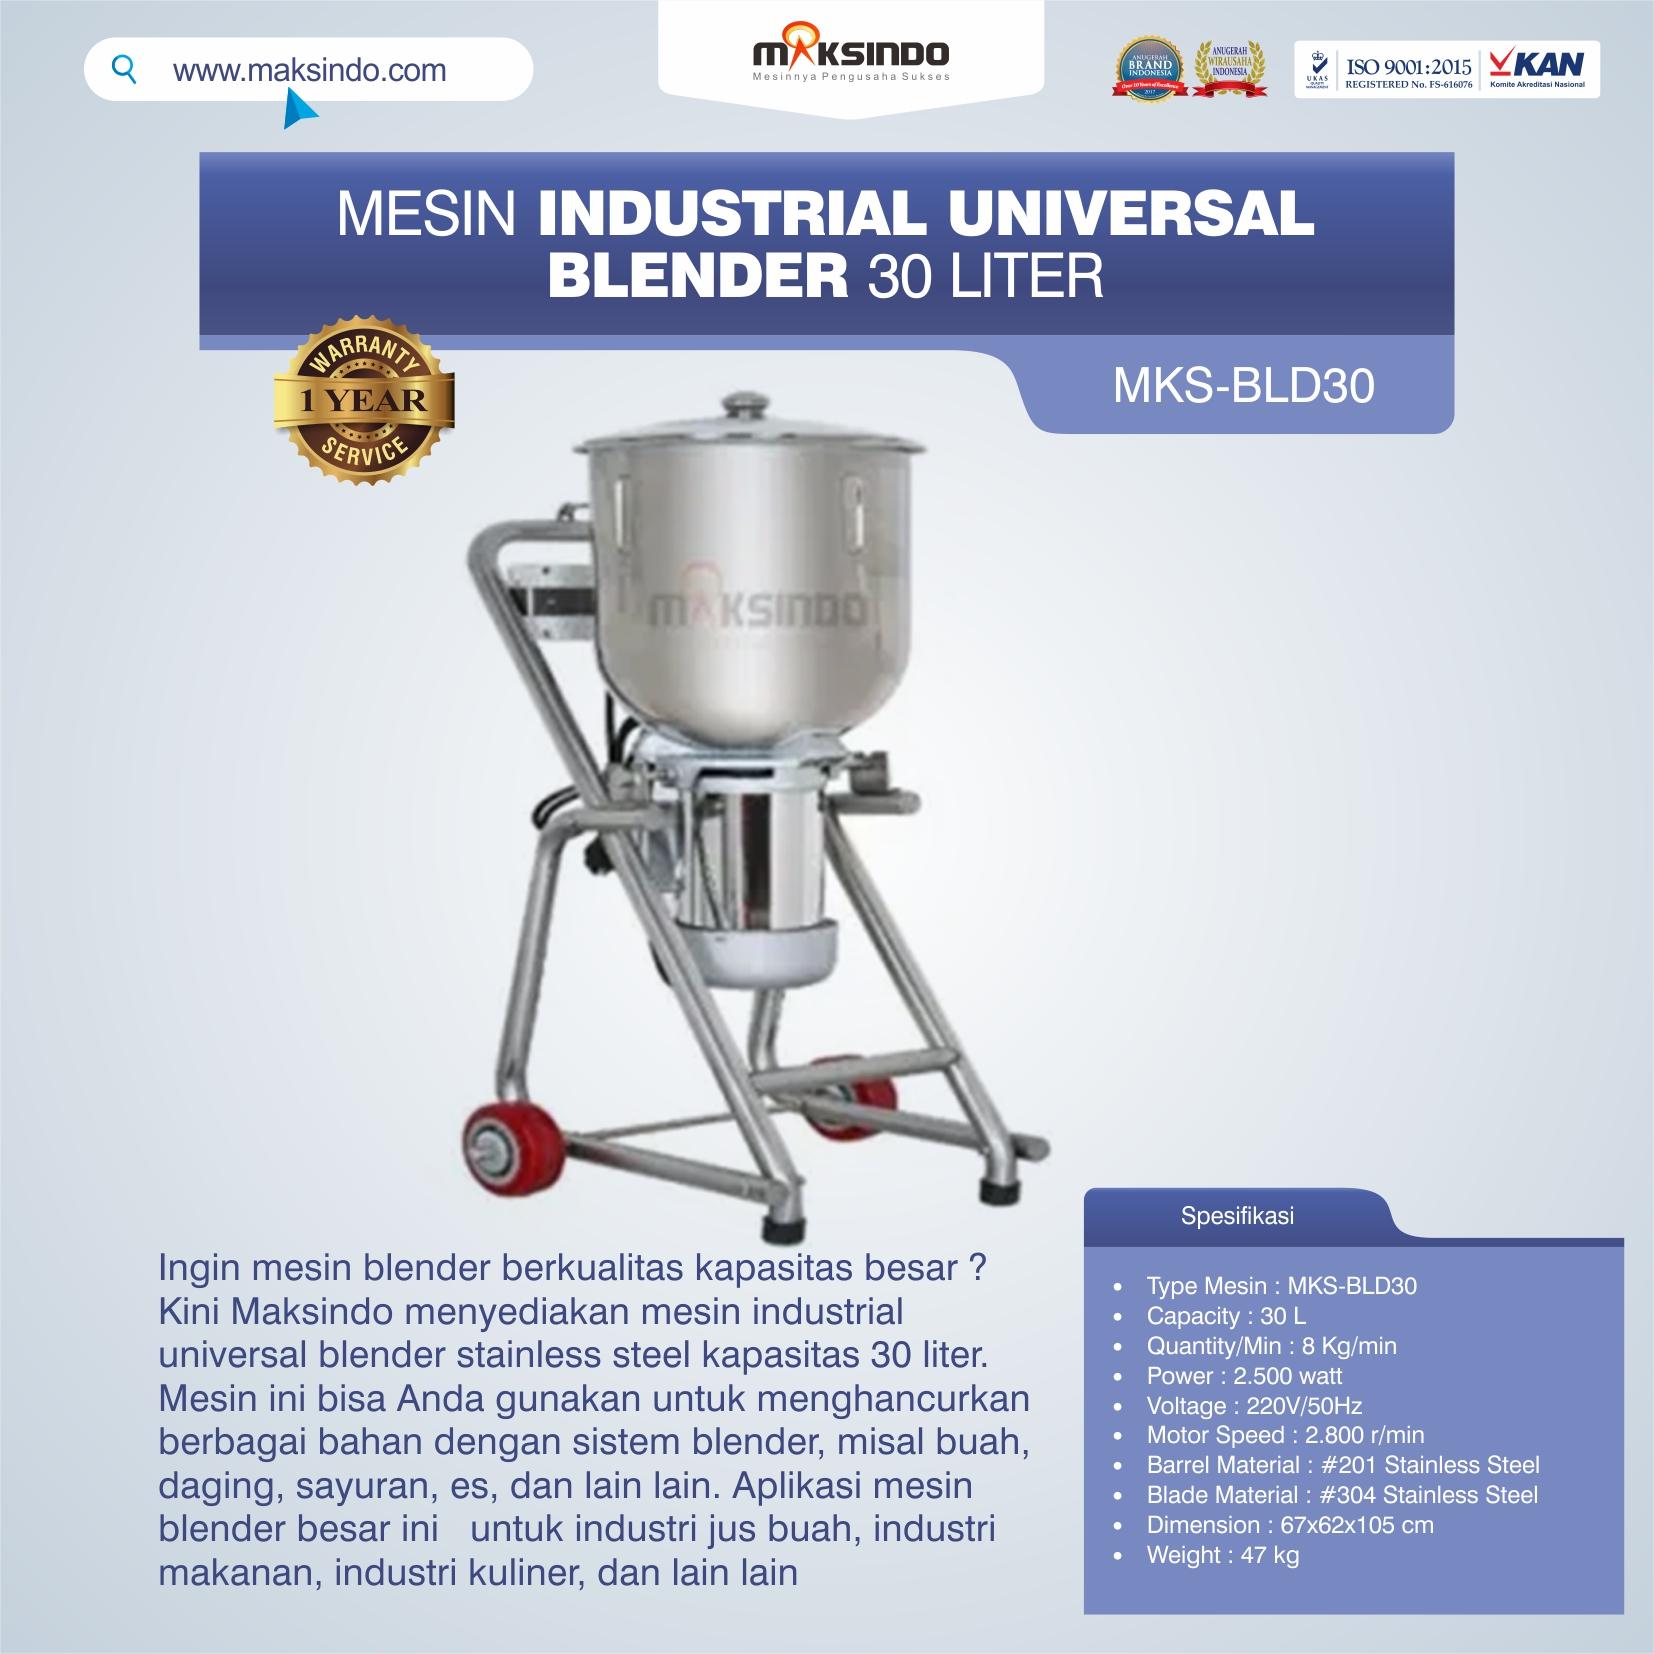 Jual Industrial Universal Blender 30 Liter MKS-BLD30 di Yogyakarta